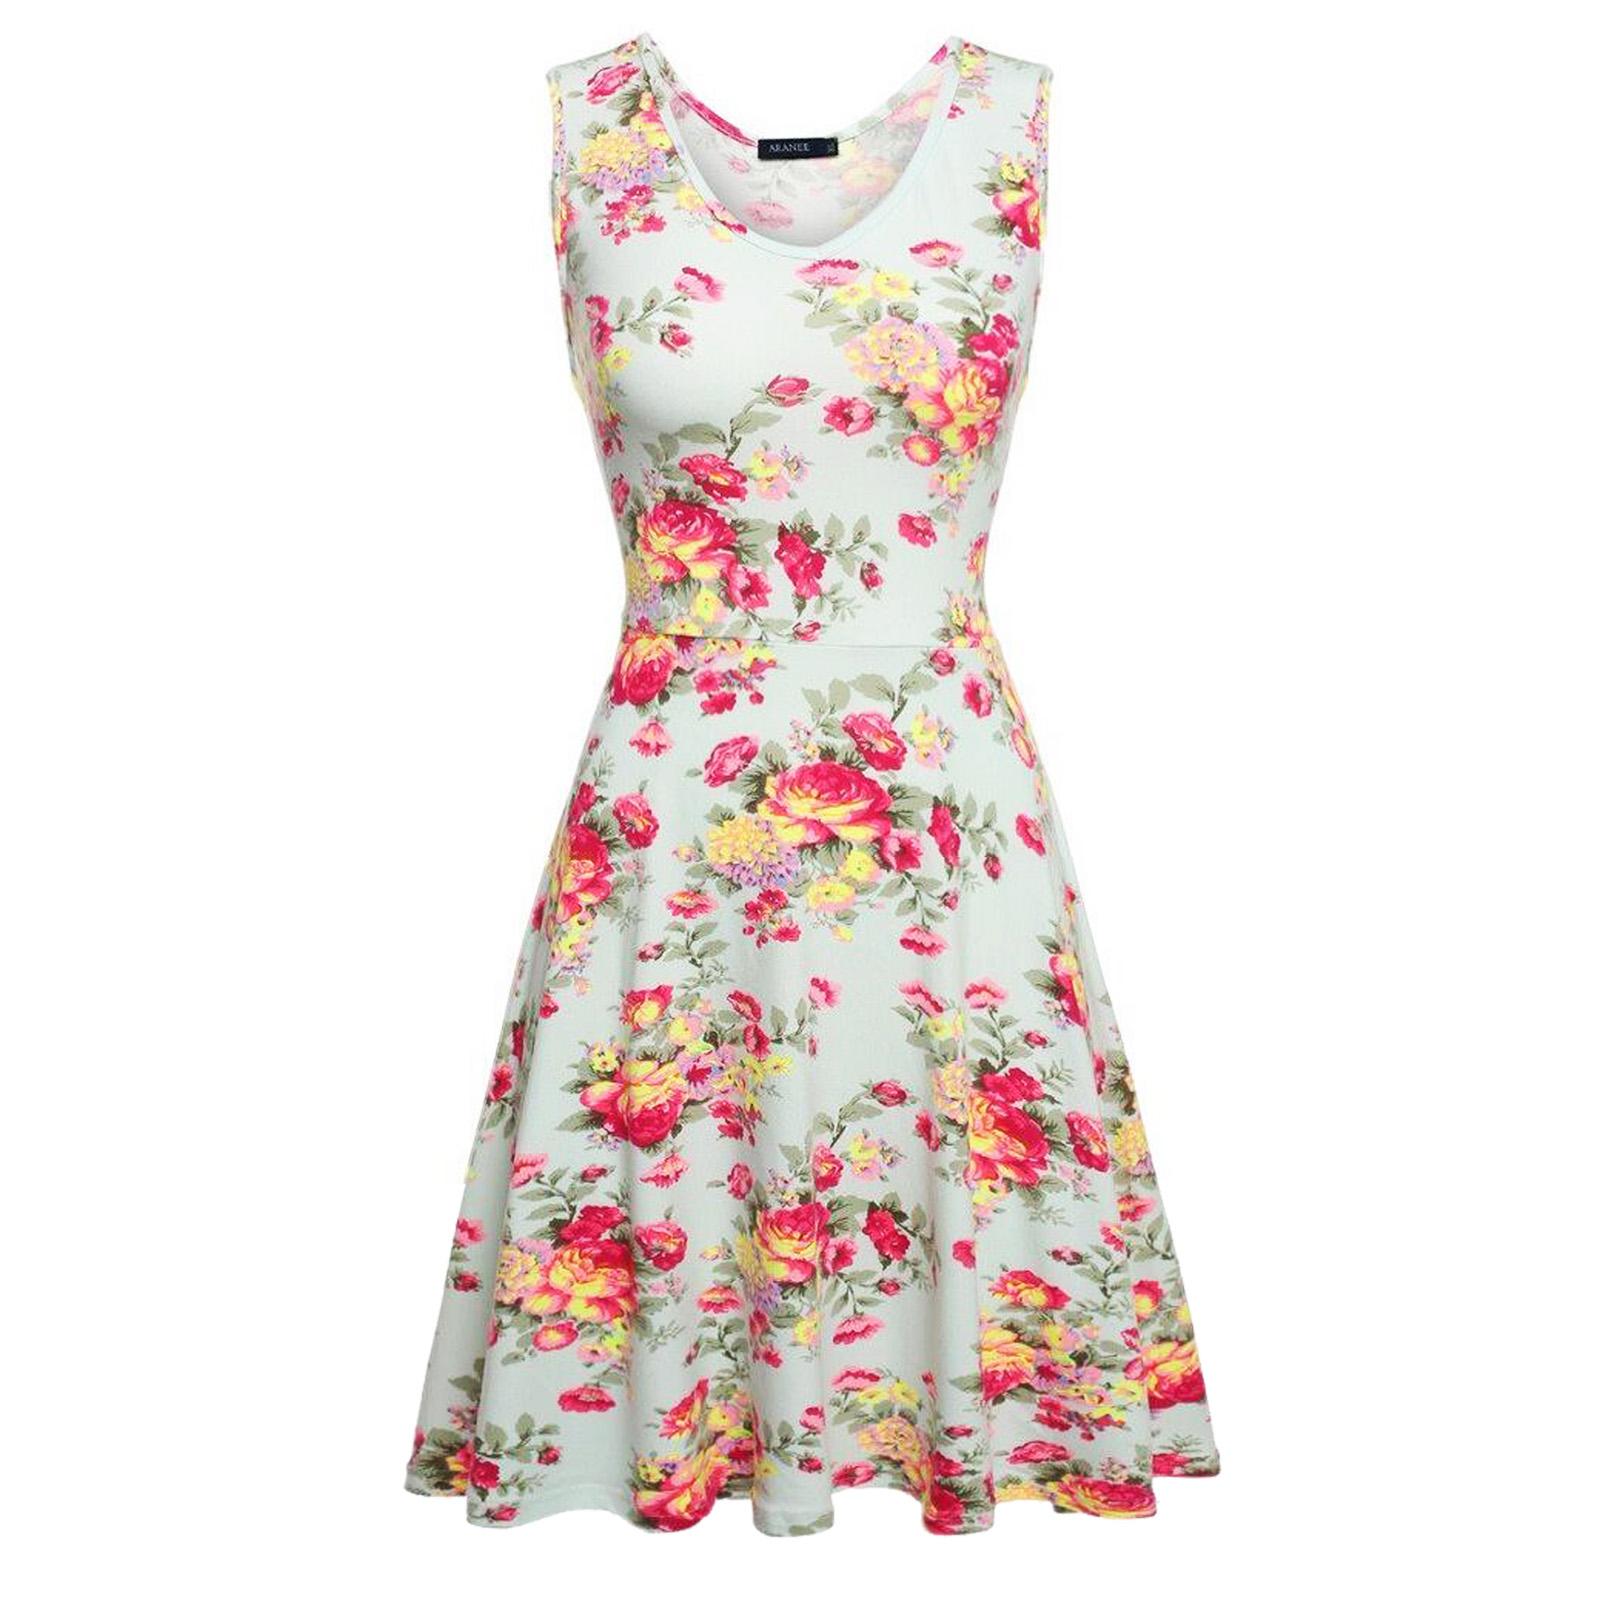 6413132128 Details about 50s 60s Swing Vintage Retro Hepburn Party Dress Women  Housewife Rockabilly Skirt